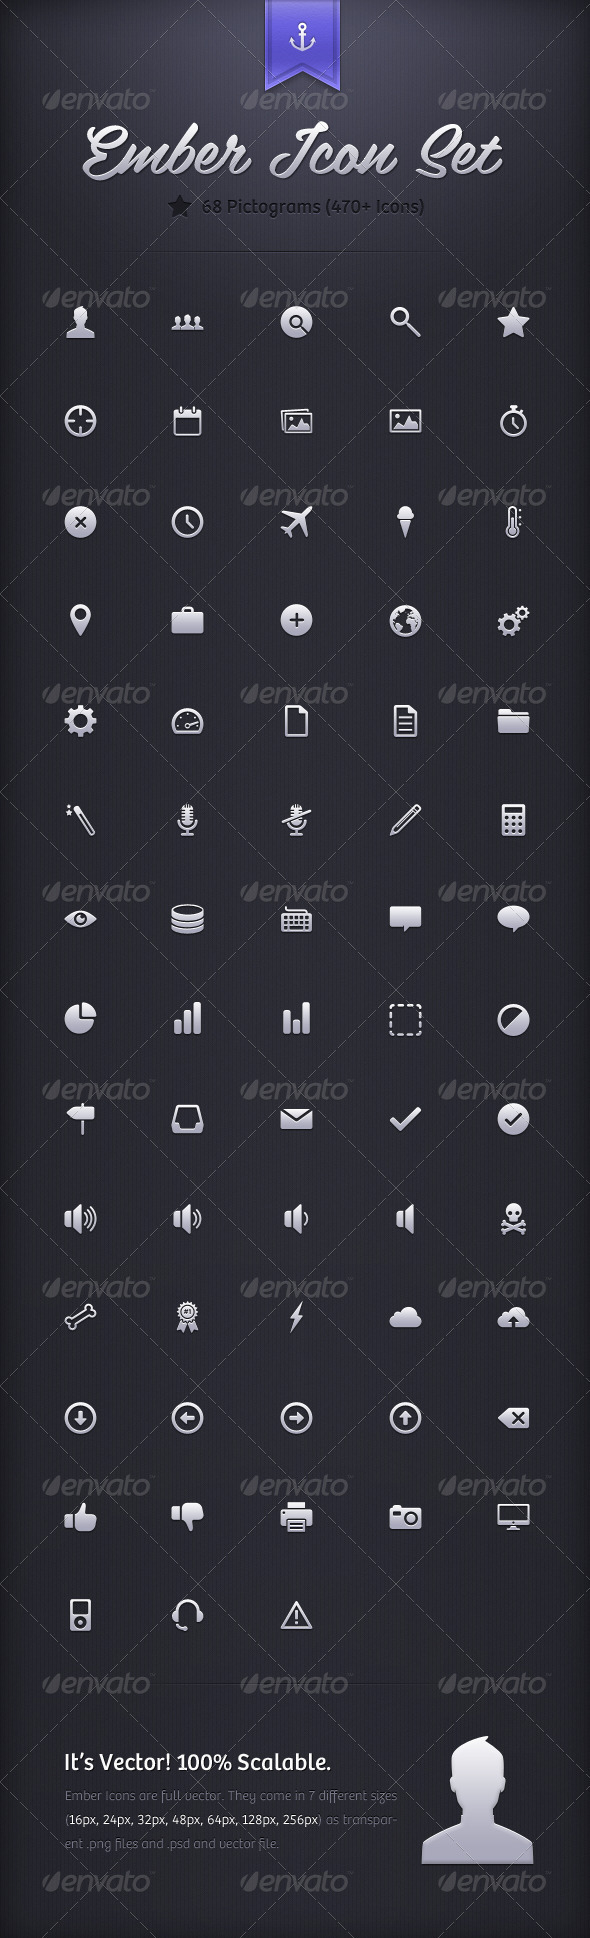 Ember Icon Set 470& Icons